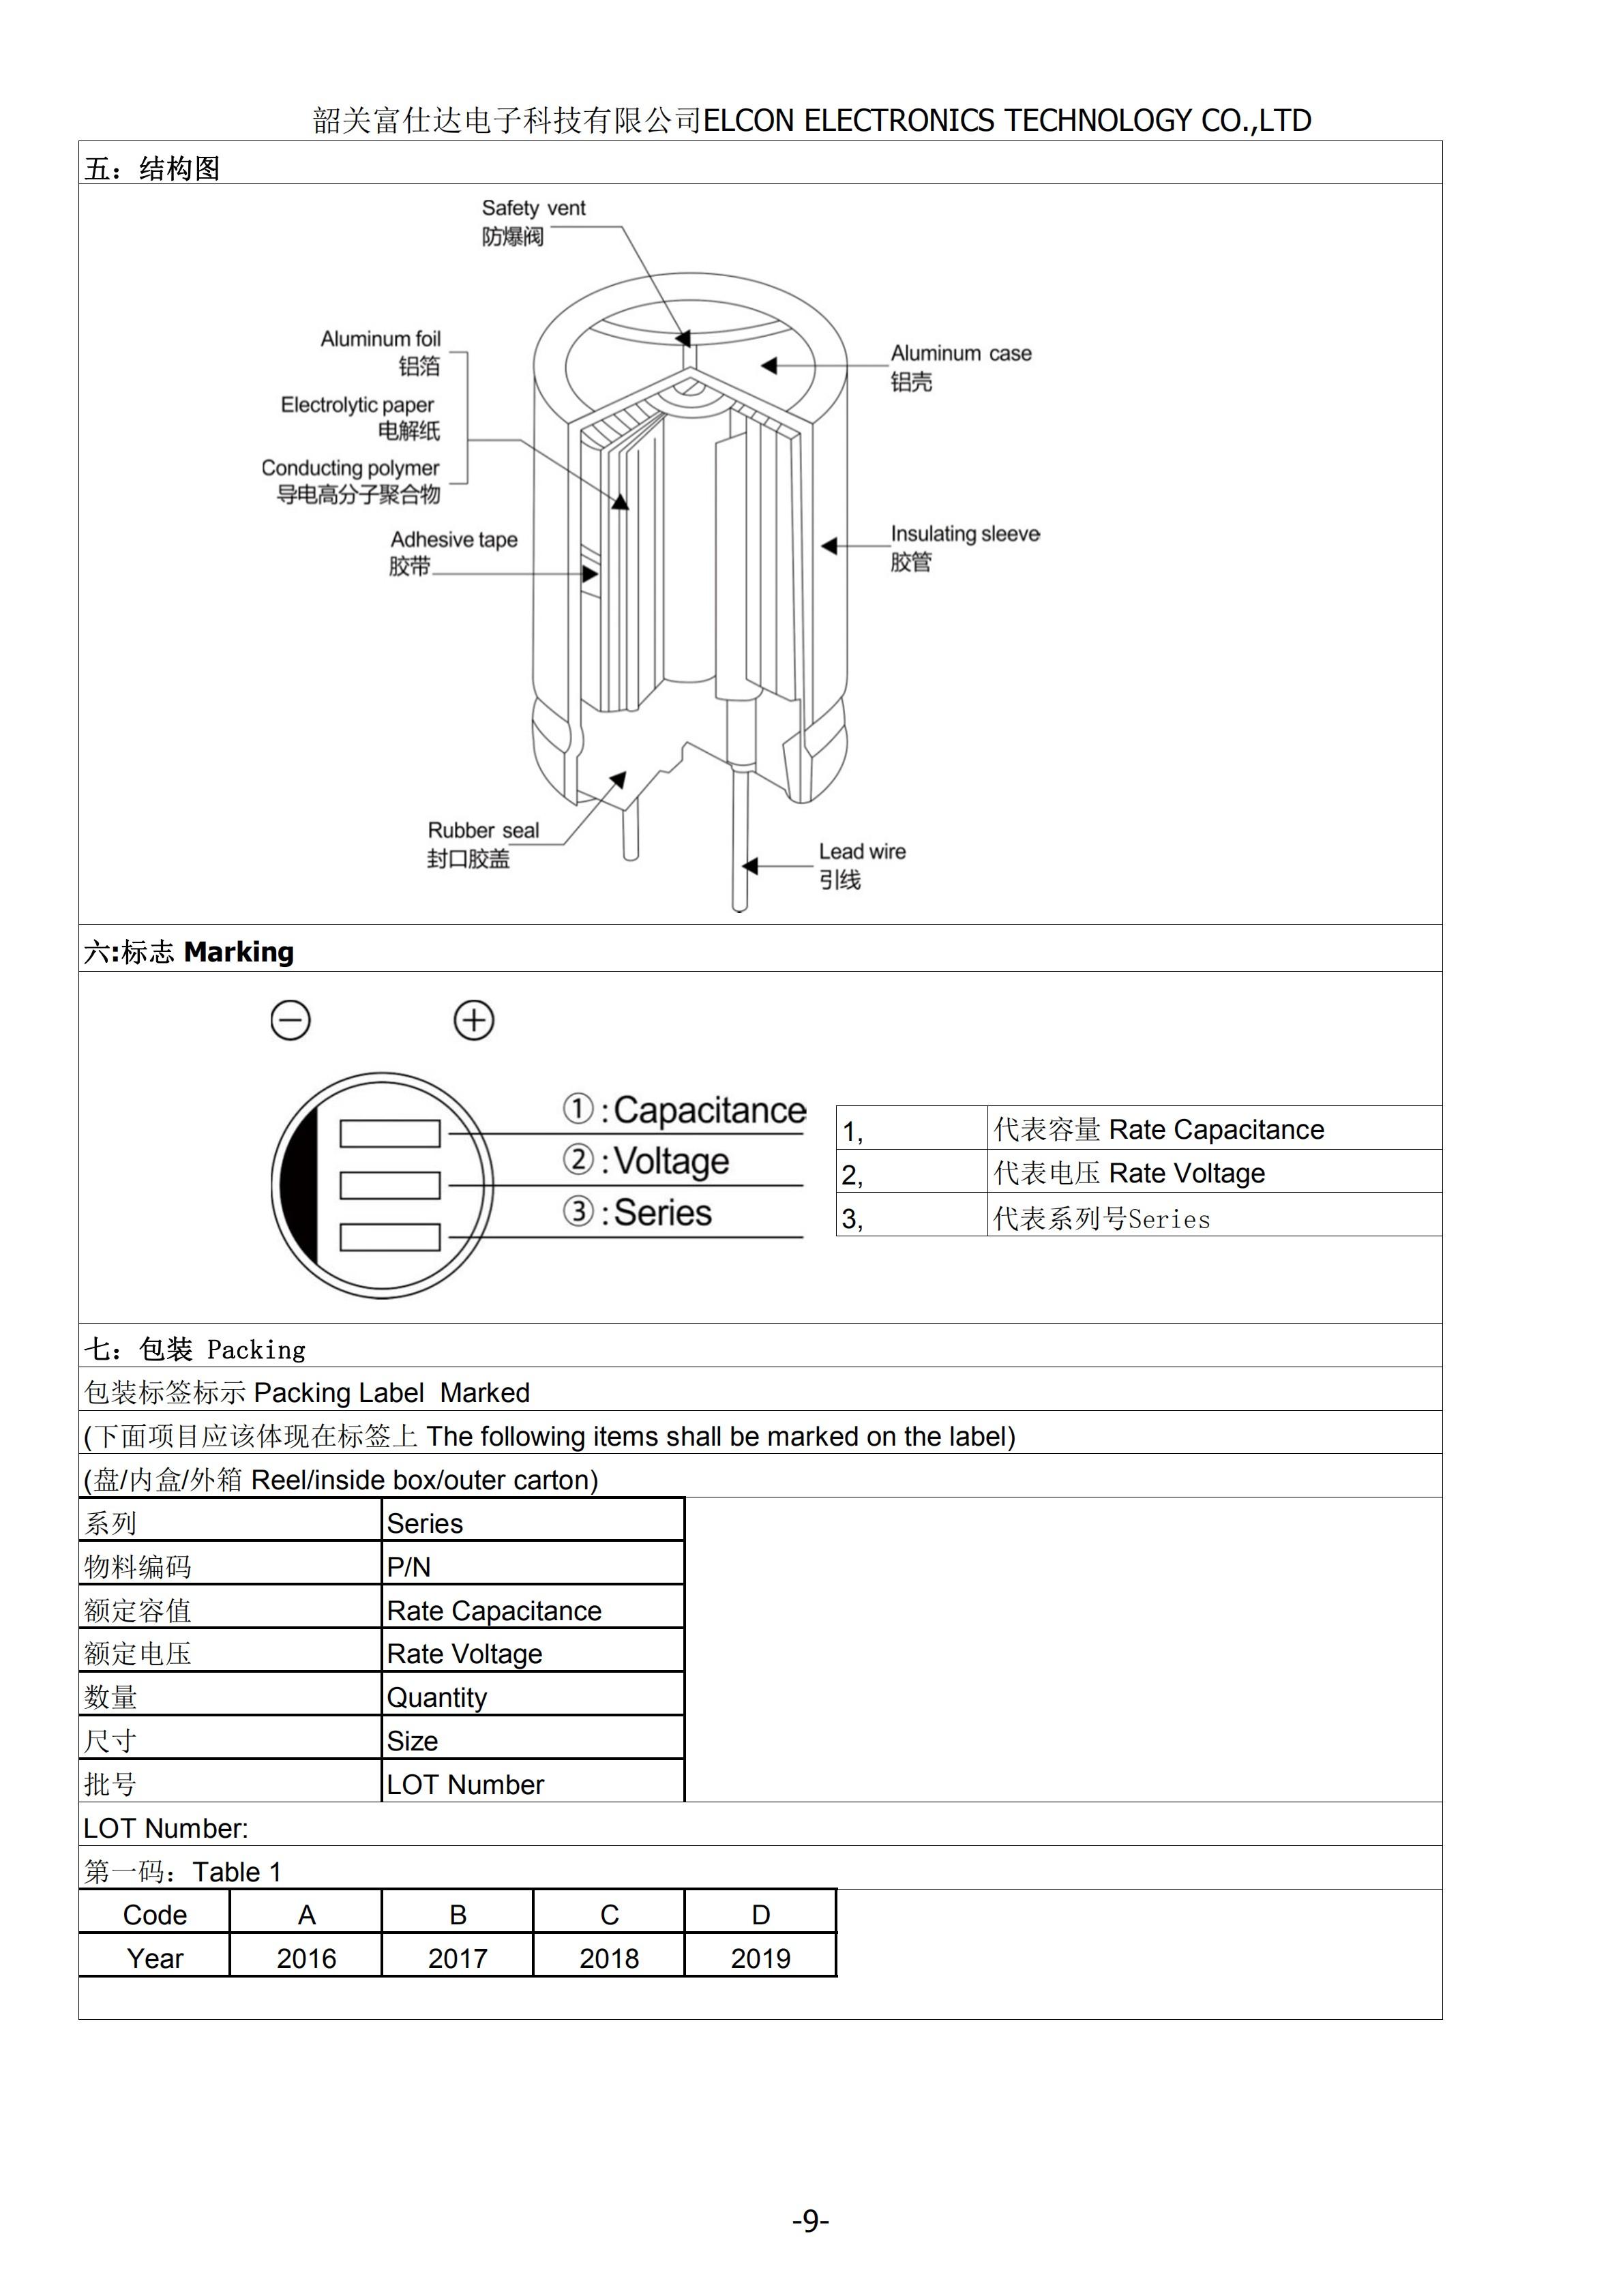 ELCON 固态电容 PB 220uf 6.3v 6.3*7mm 直插固态电容器(图5)